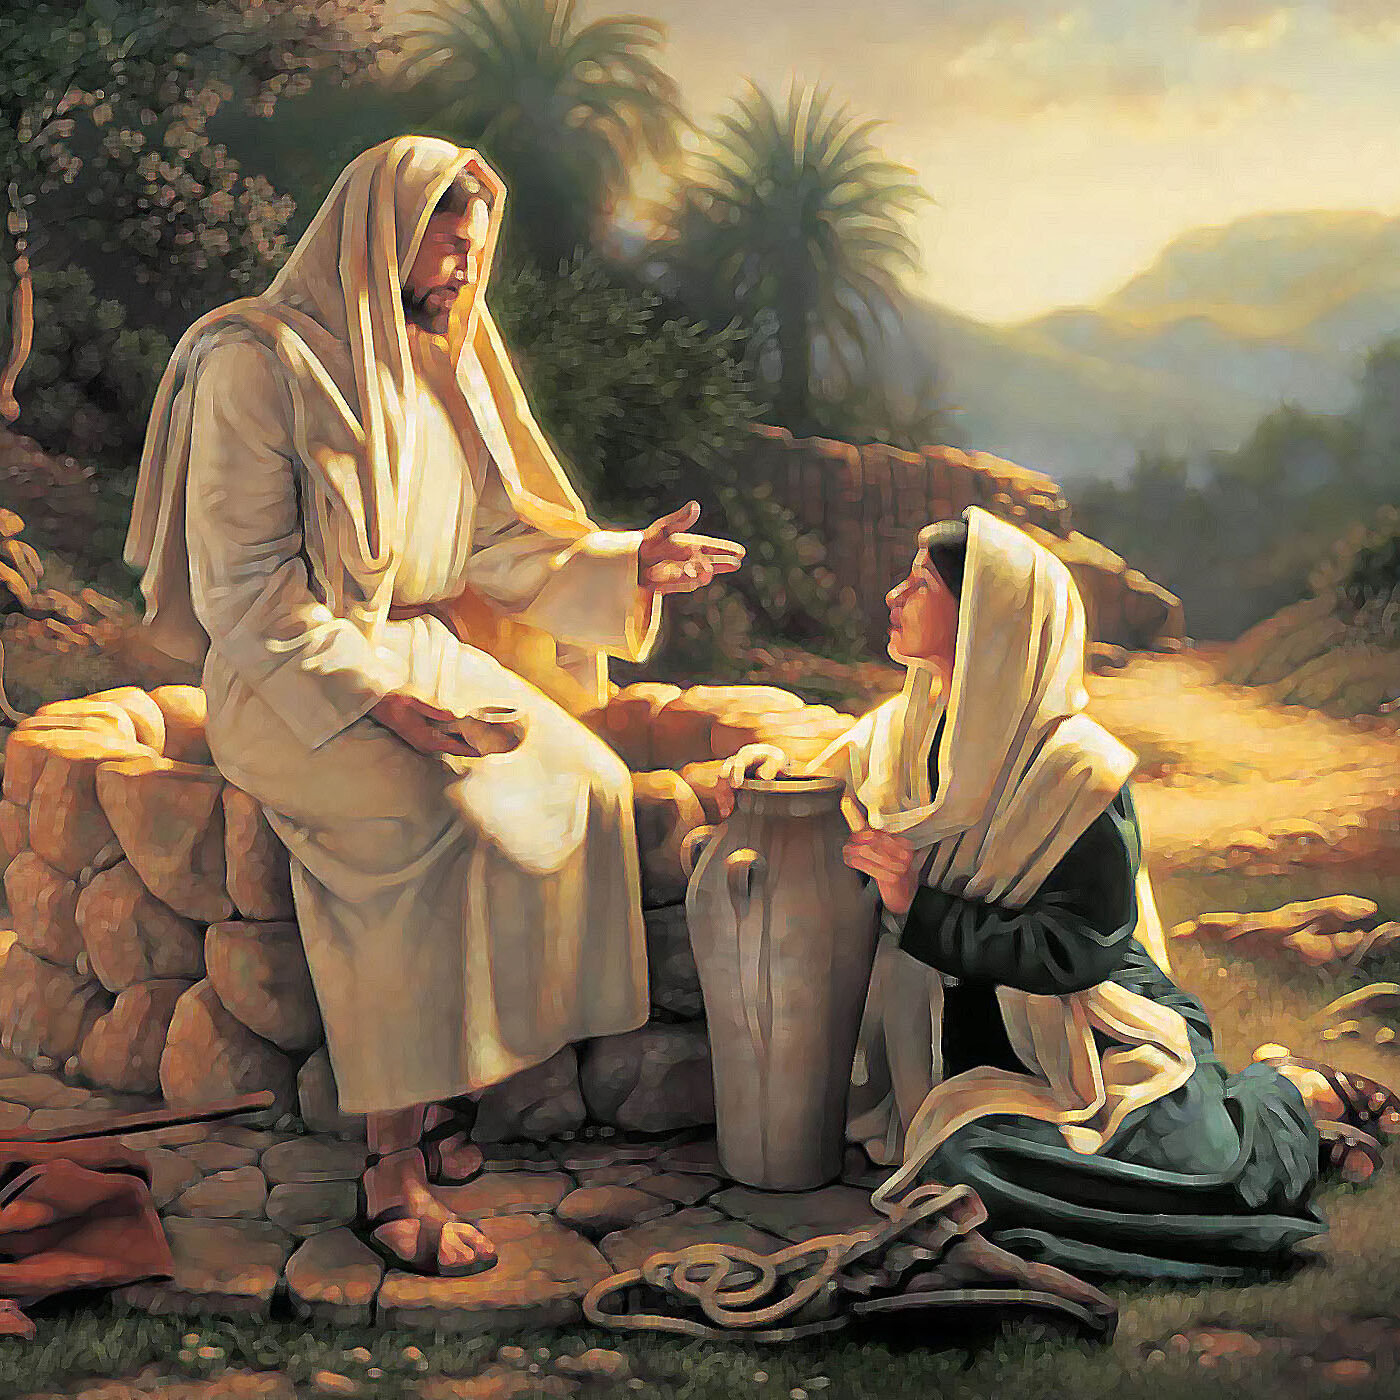 riflessioni sul Vangelo di Mercoledì 21 Ottobre 2020 (Lc 12, 39-48) - Apostola Michela